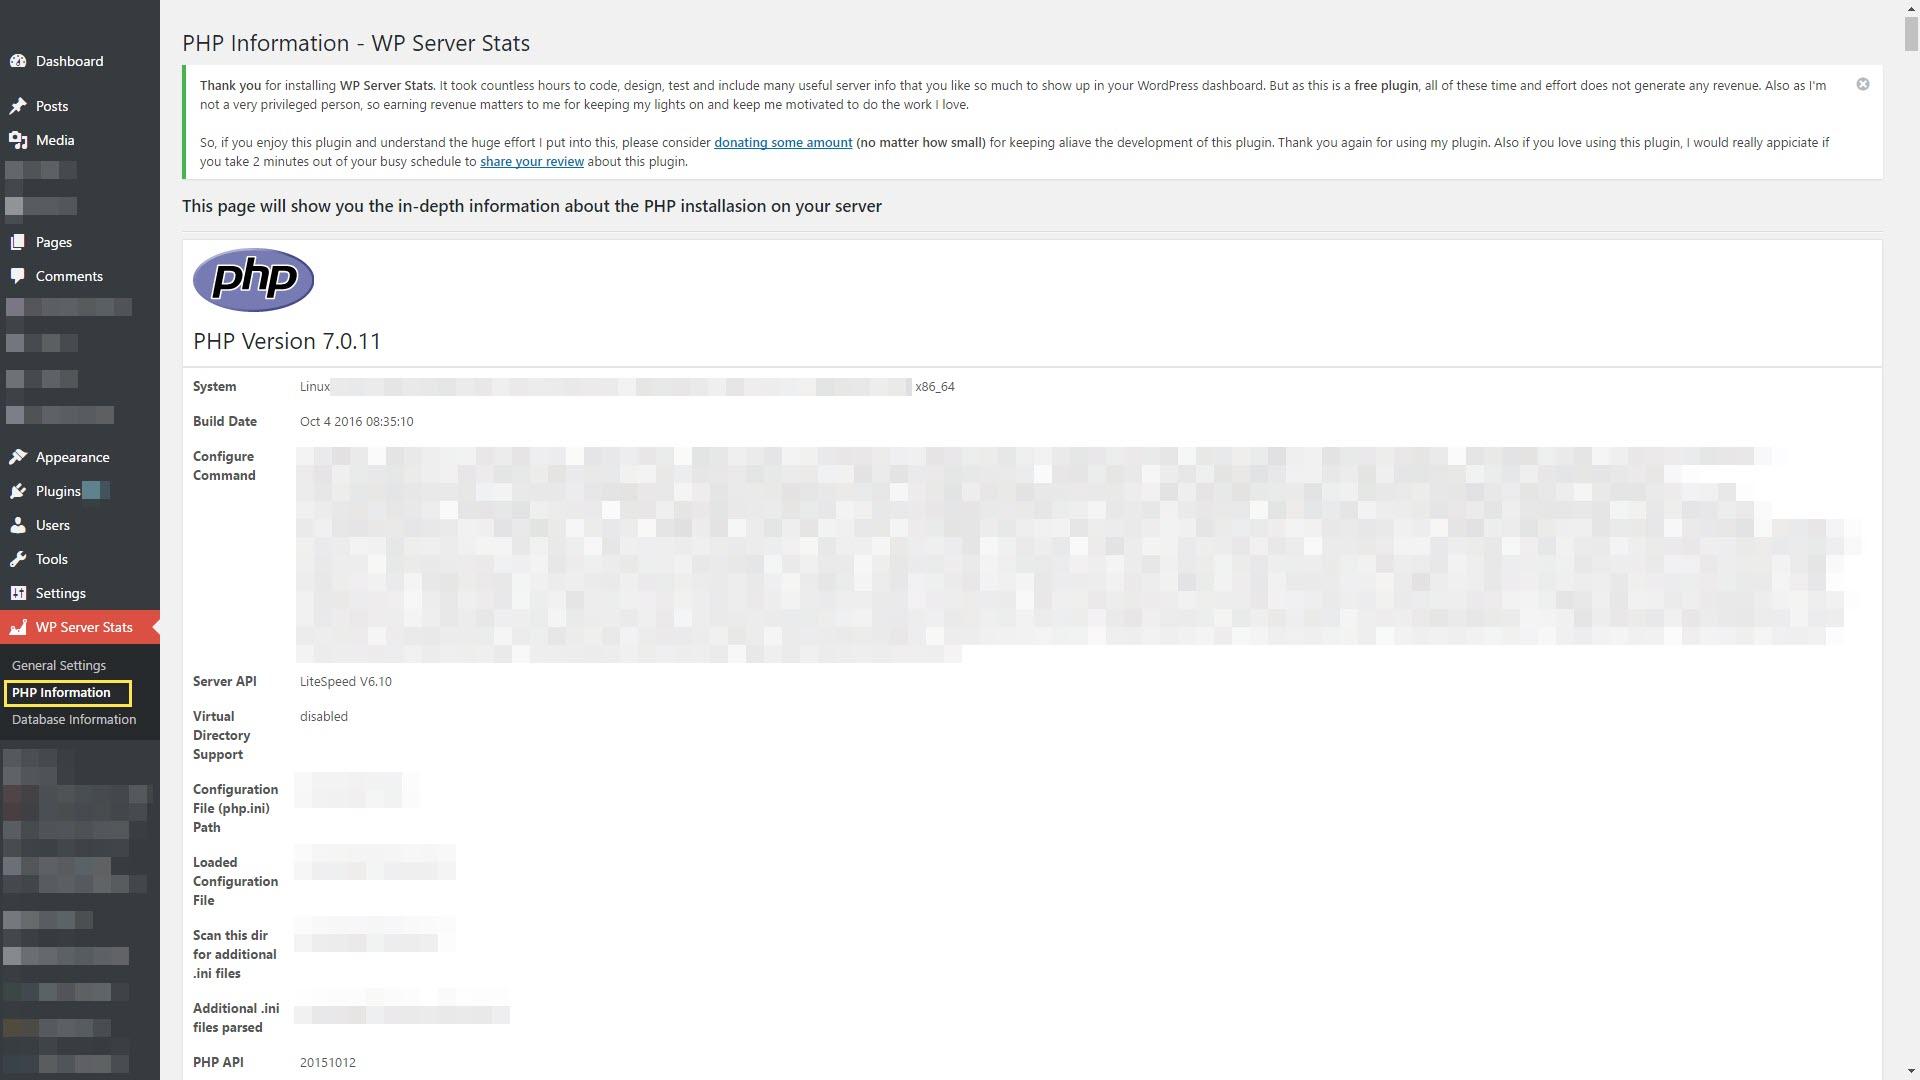 Screenshots WP Server Stats WordPressorg